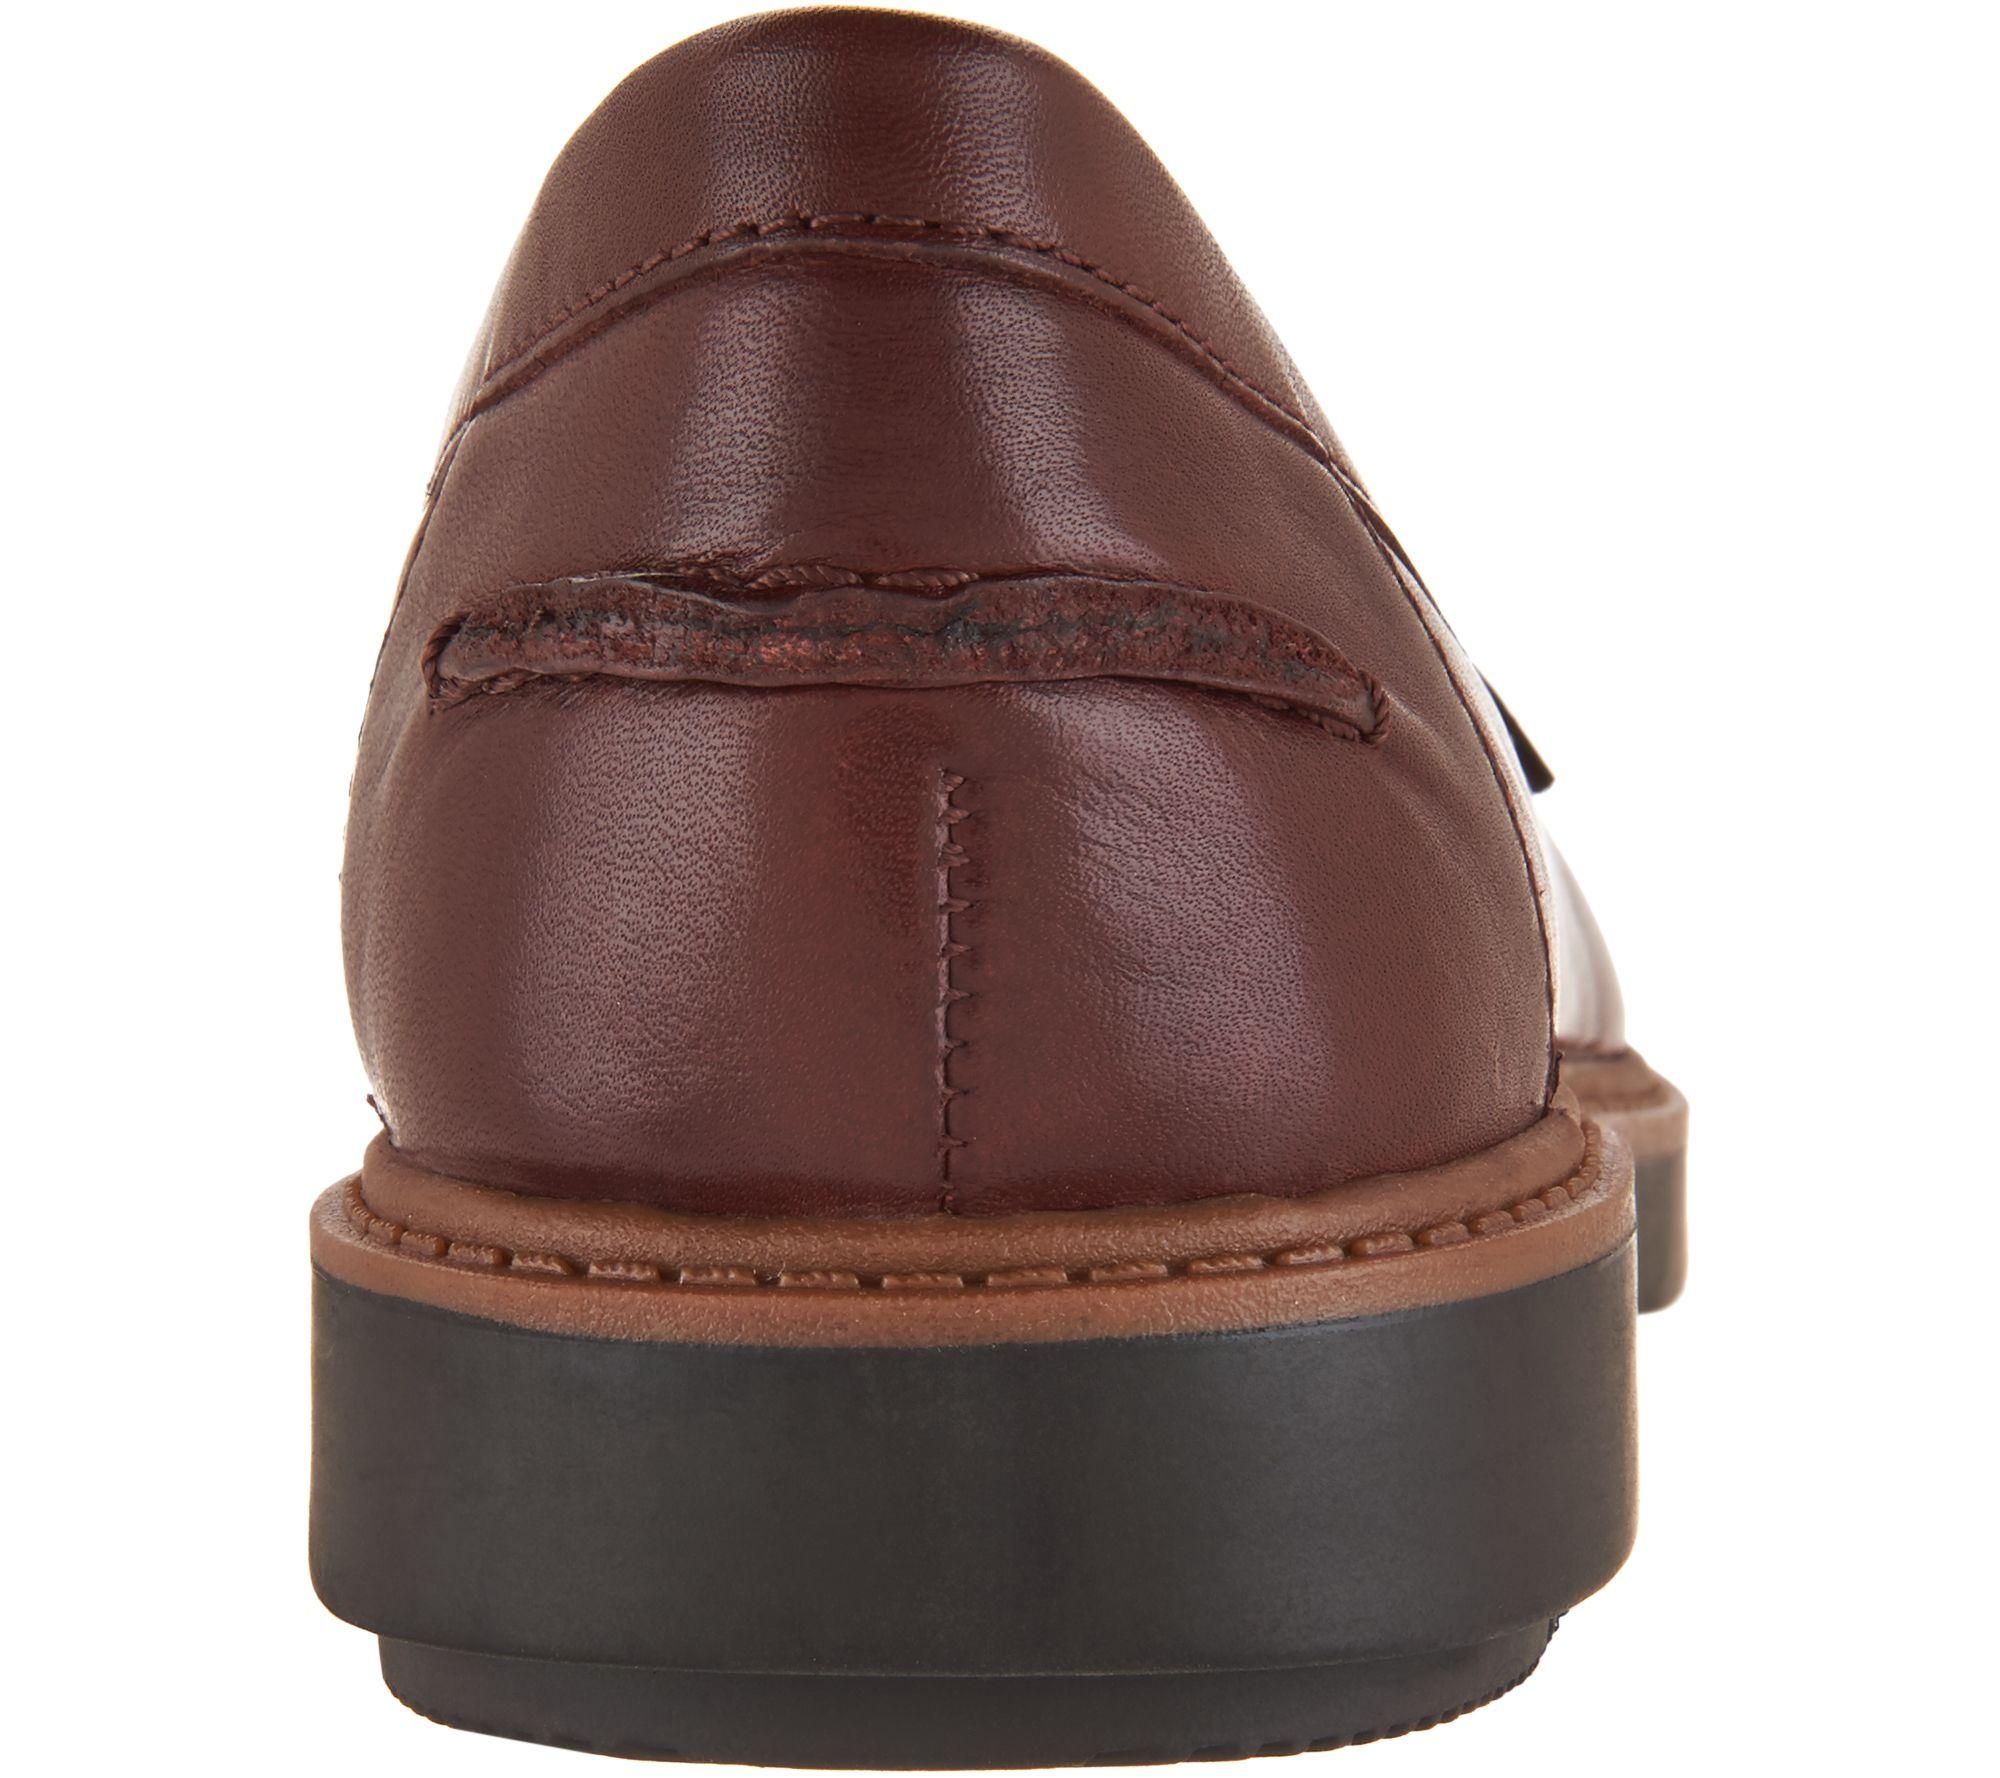 60e08caf30e Clarks Leather Slip-on Loafers - Raisie Eletta - Page 1 — QVC.com